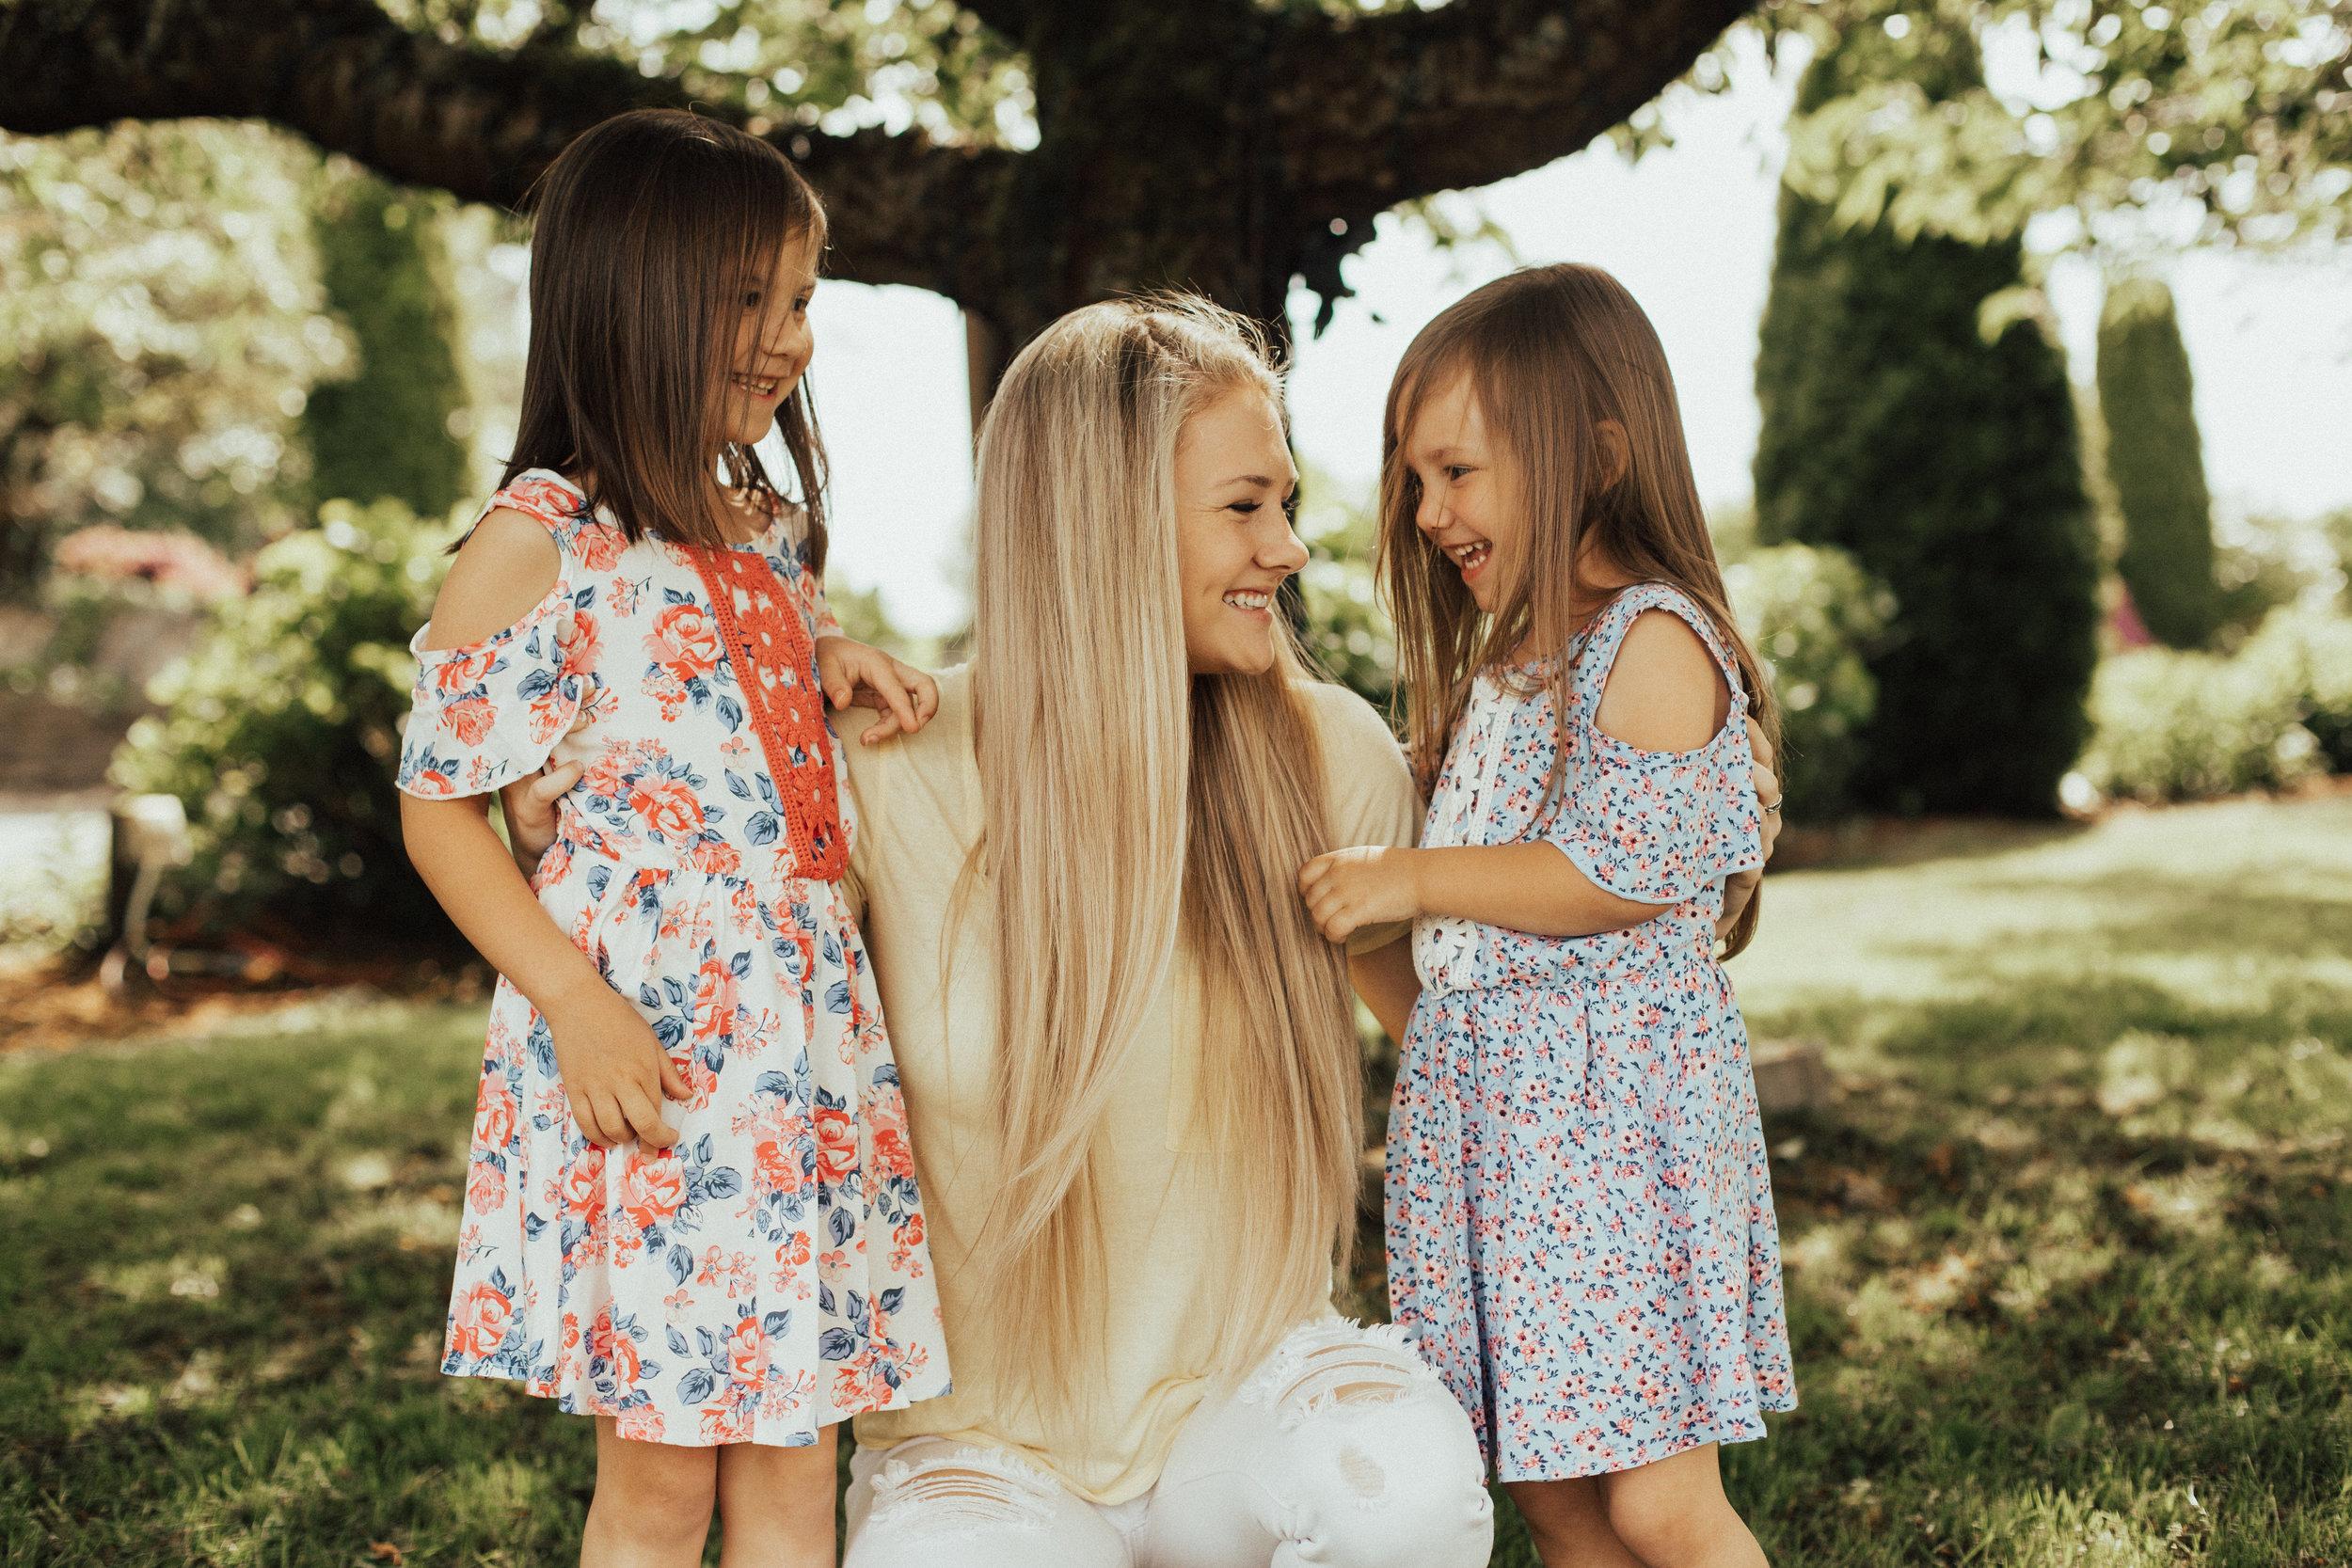 Lacey Shulke Family Photos-Lacy Shulke-0002.jpg